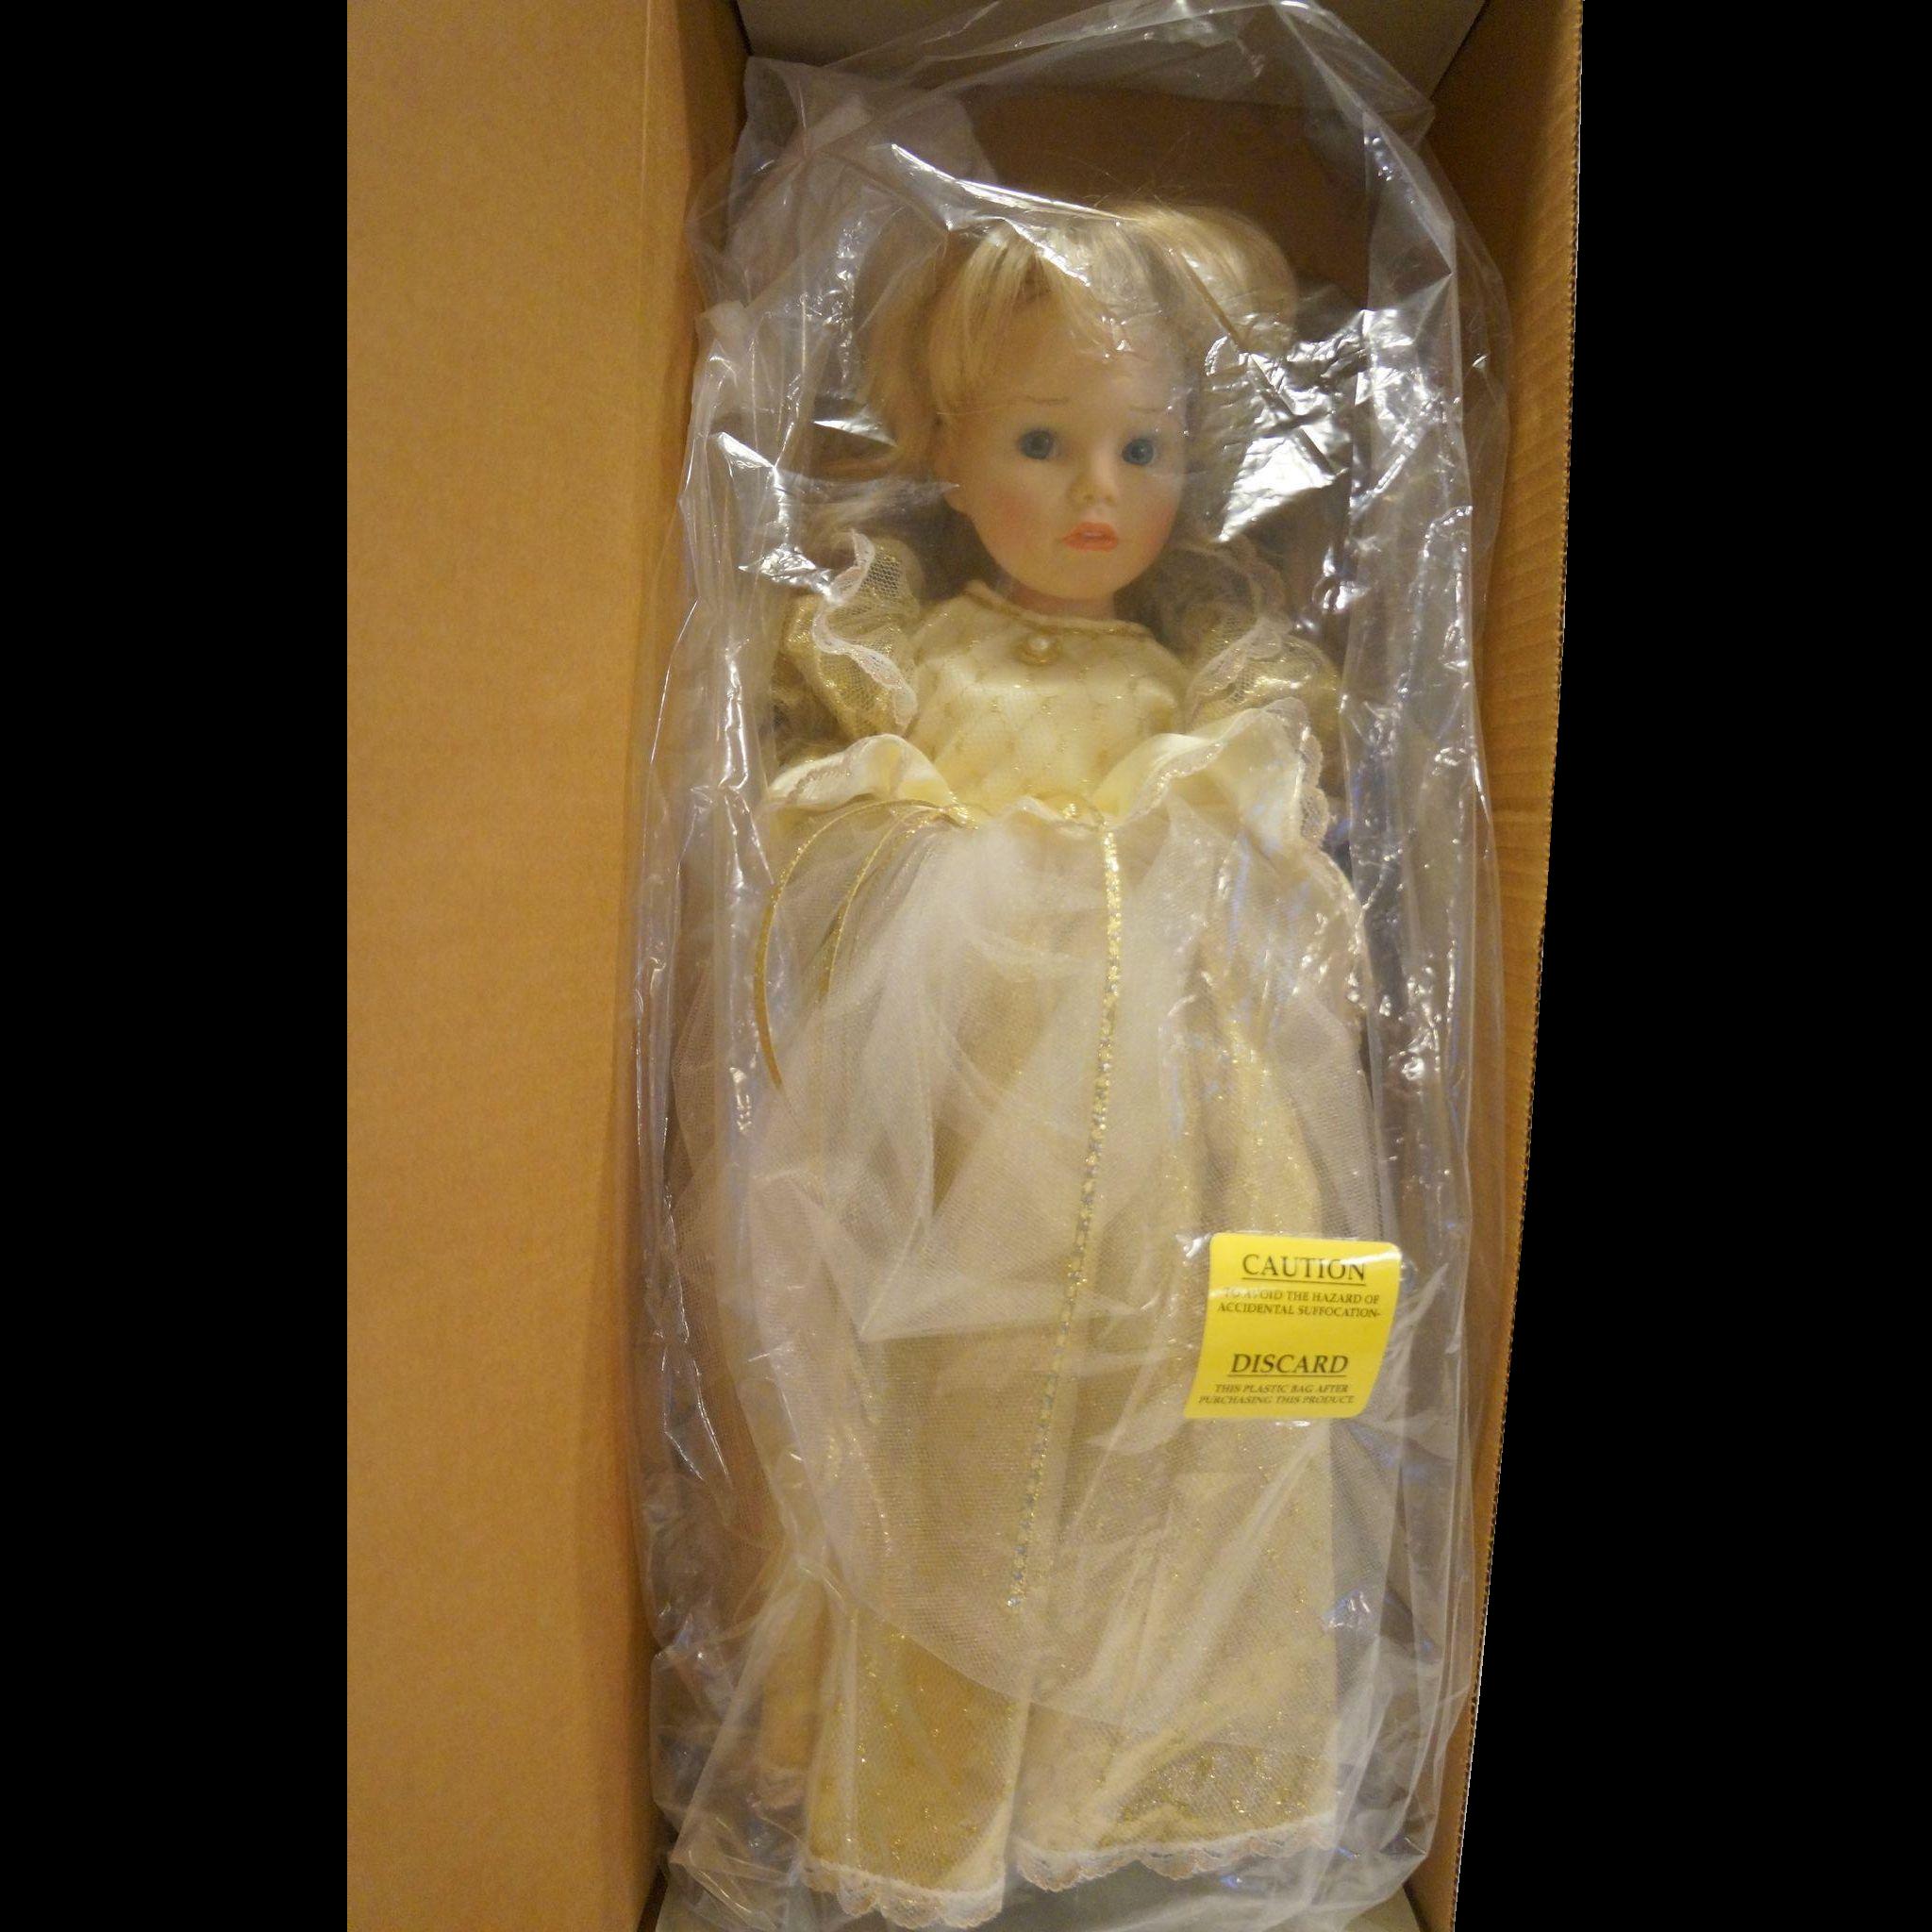 Susan Wakeen Cinderella Doll 19 IN Limited Edition 294/5000 NIB White Gold Dress